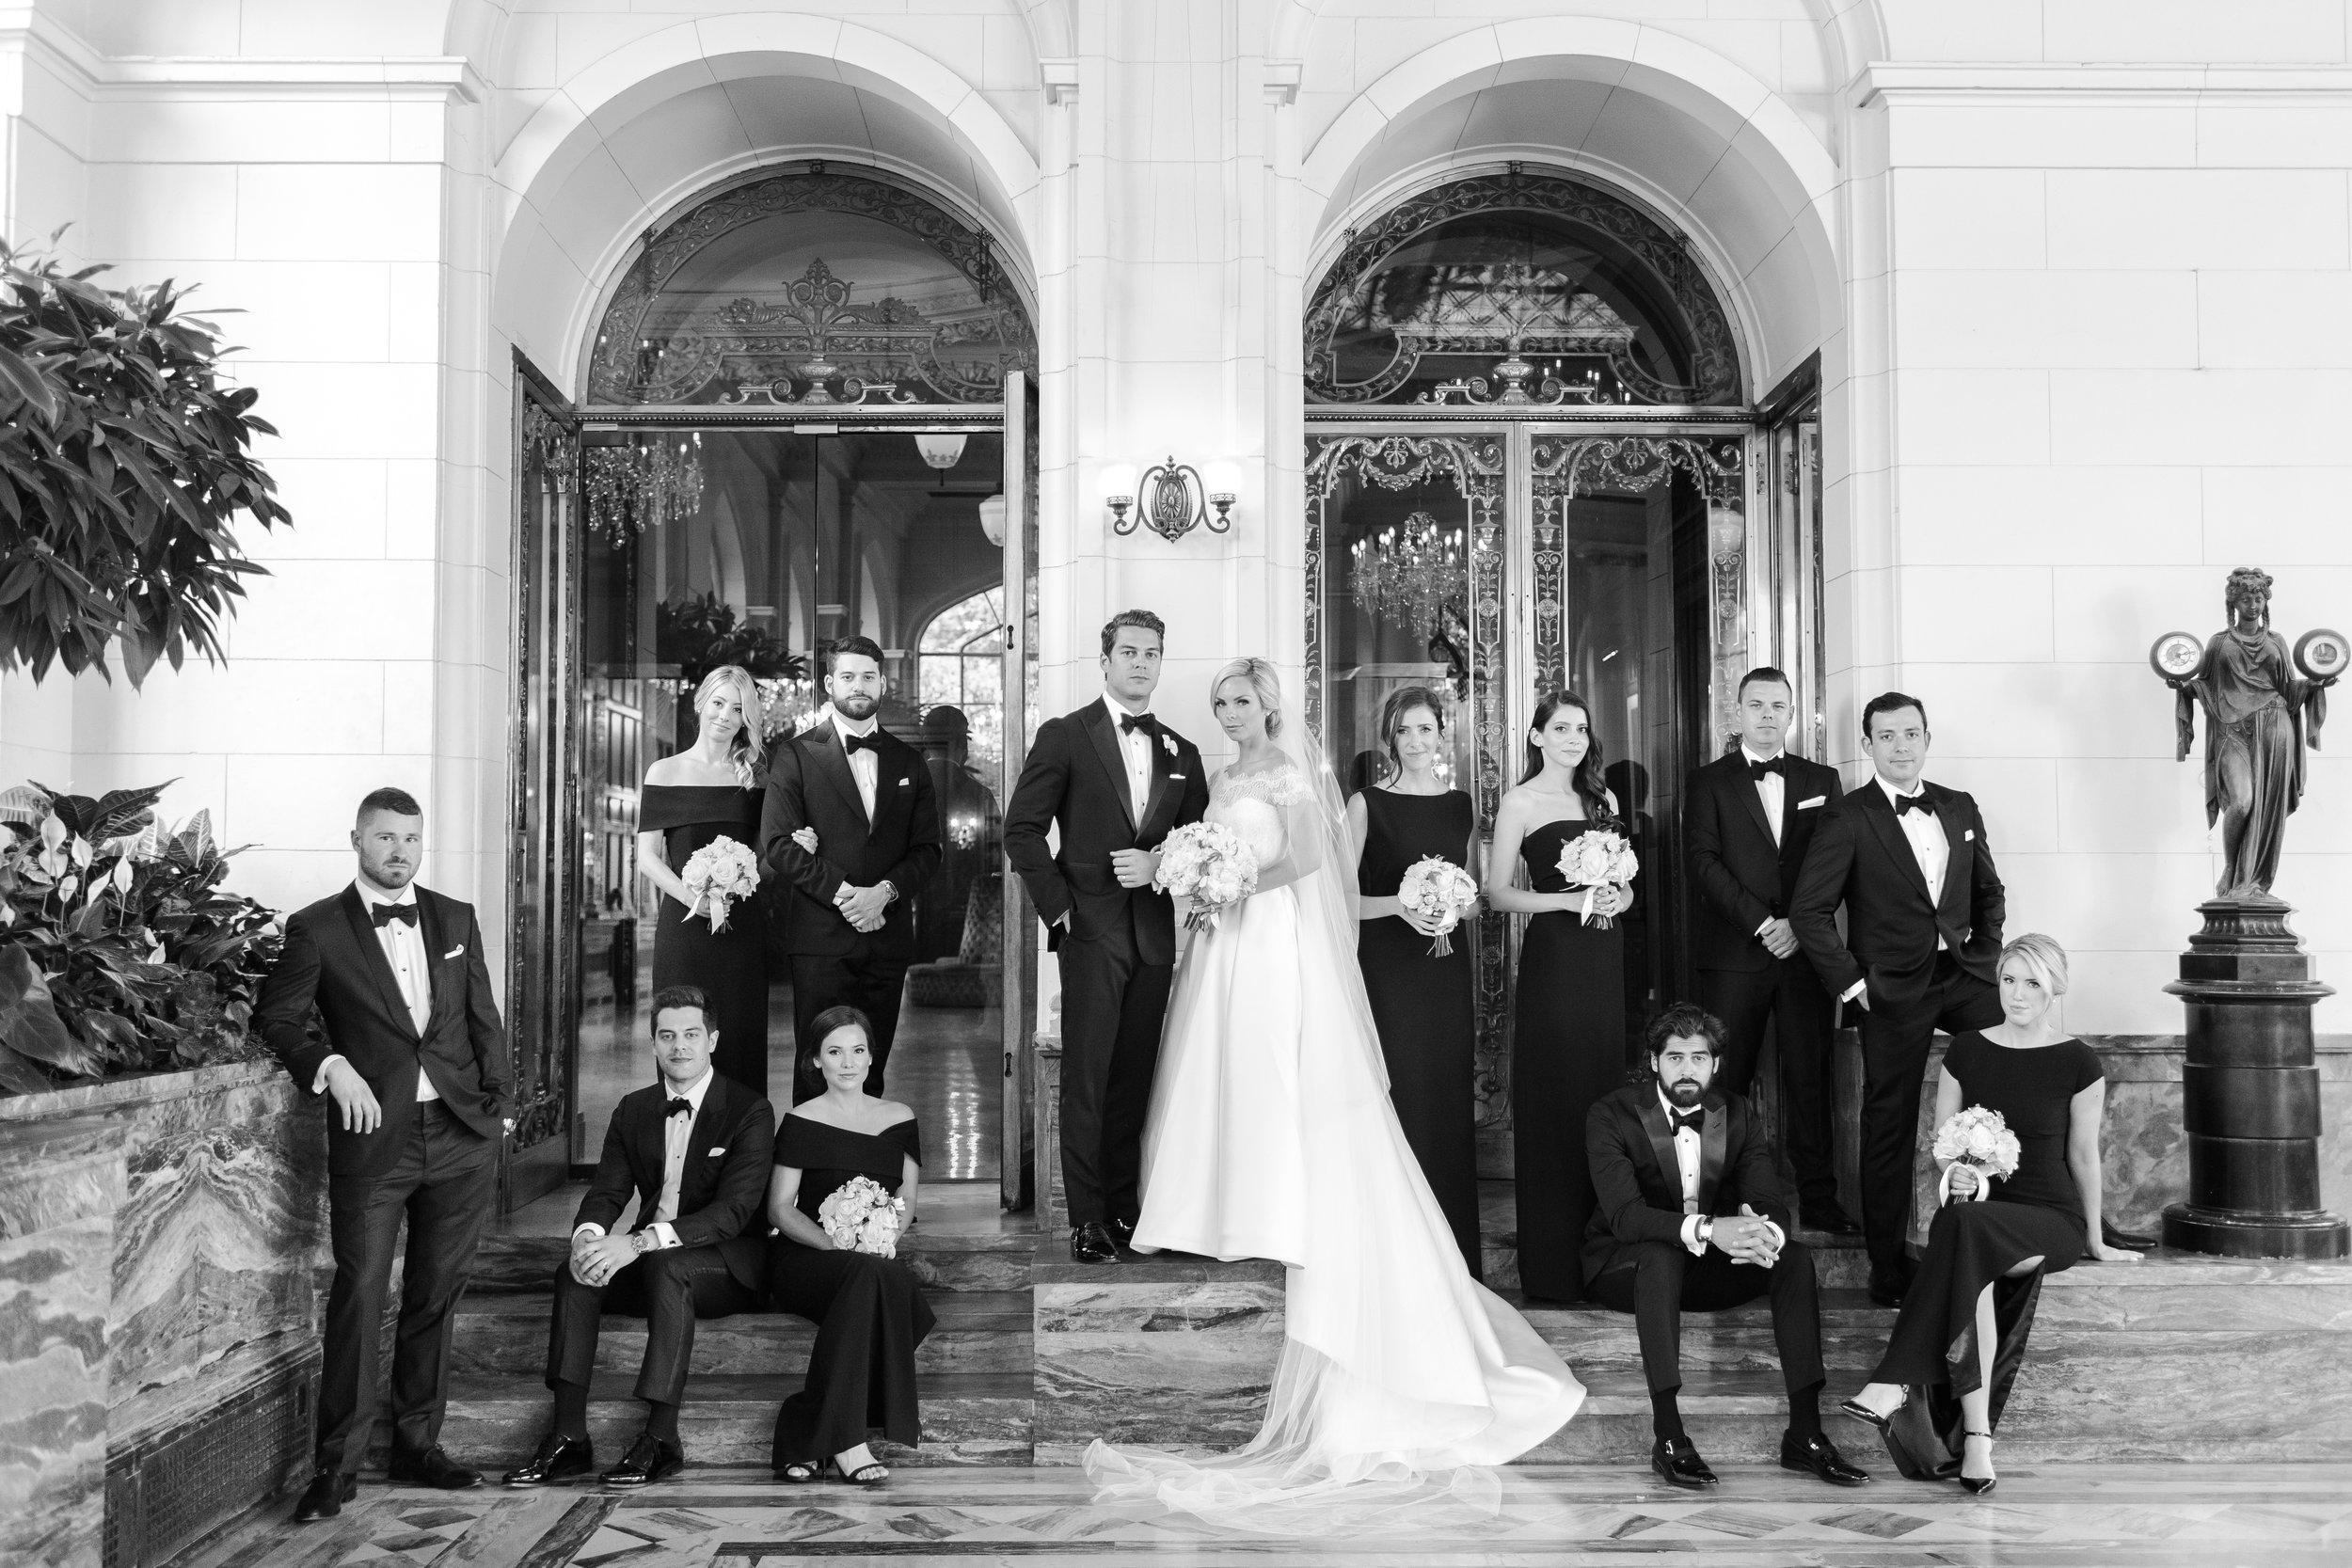 casa-loma-best-toronto-wedding-photographer-soft-bright-pastel-richelle-hunter-aynsley-richie-600.jpg